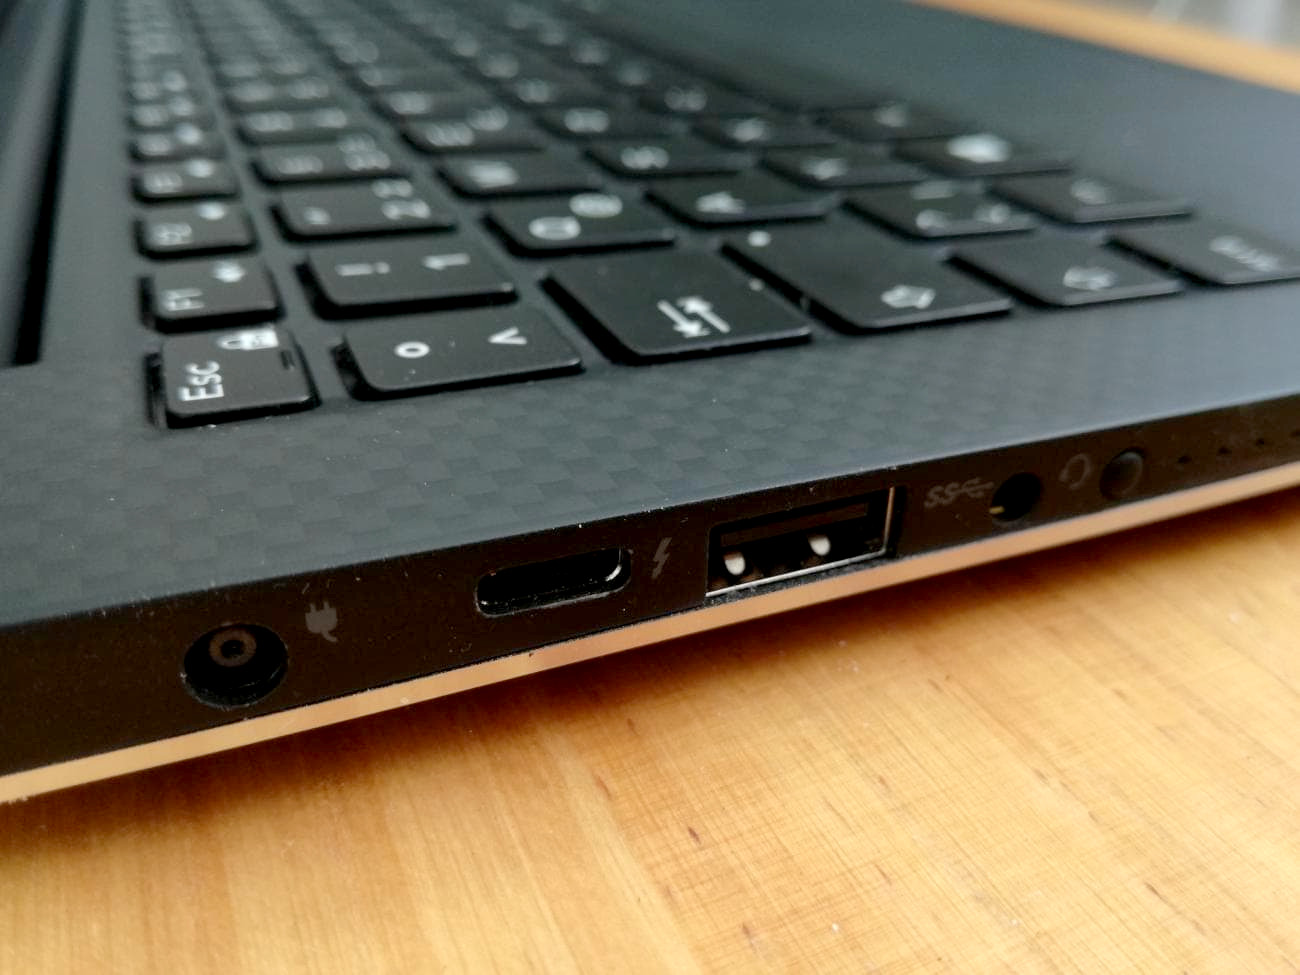 USB C Port